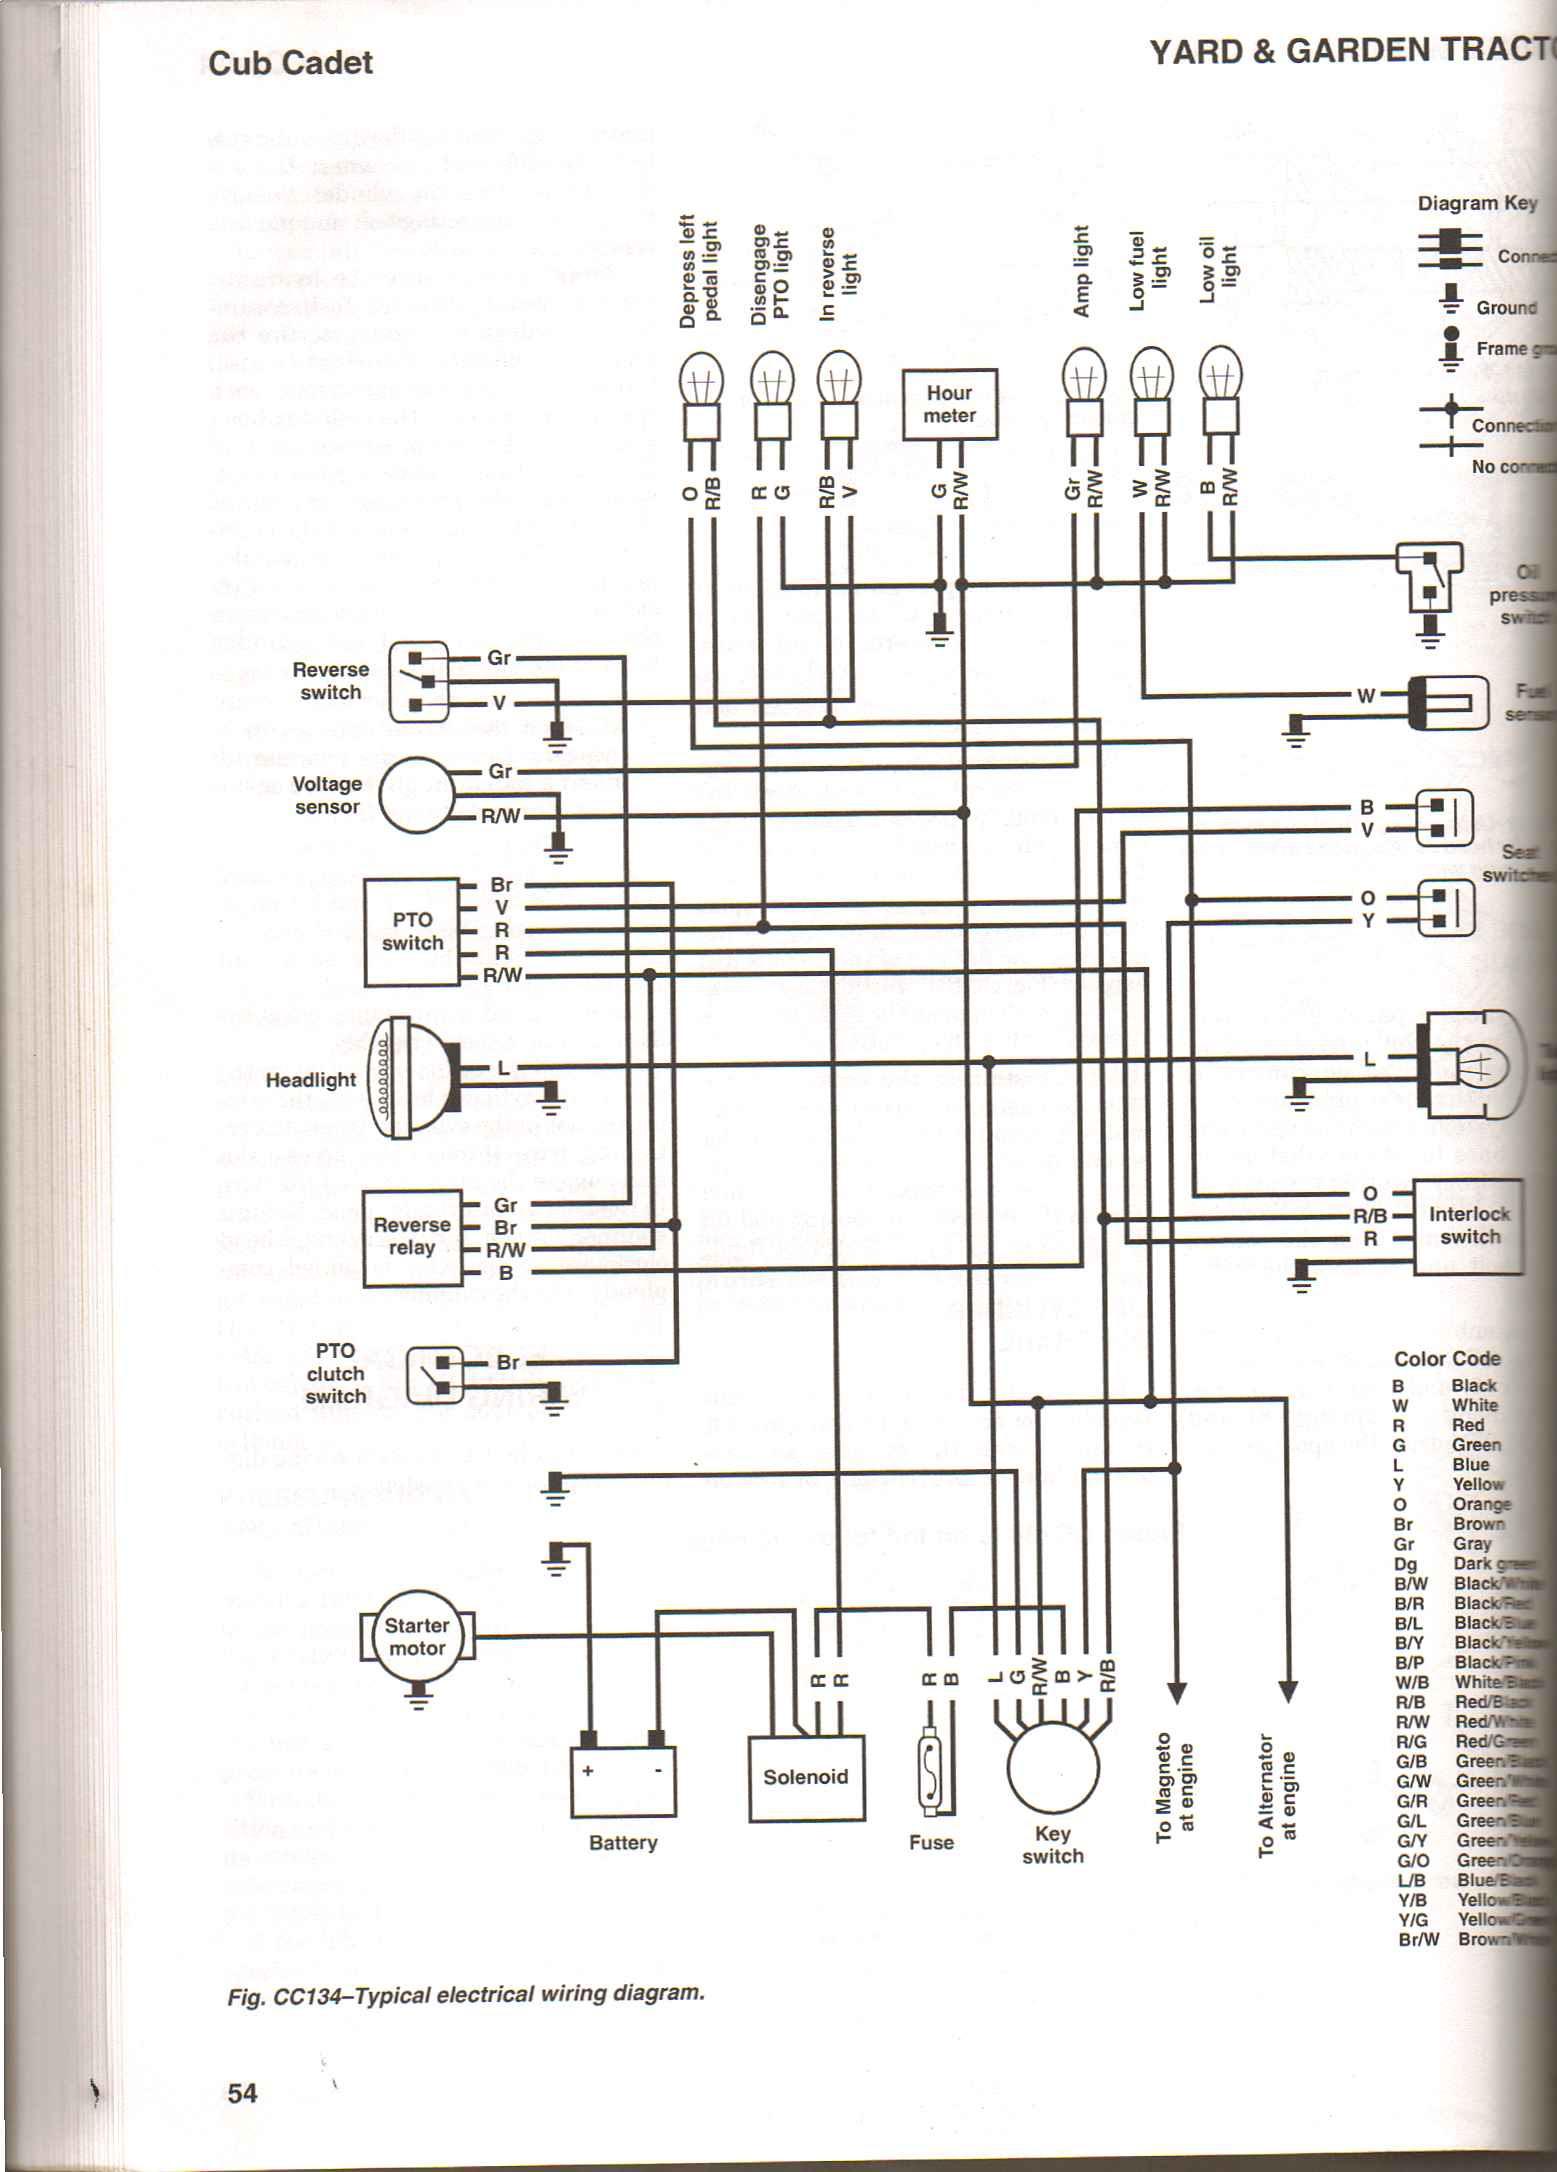 Diagram 2135 Cub Cadet Wiring Diagram Full Version Hd Quality Wiring Diagram Tsou As4a Fr